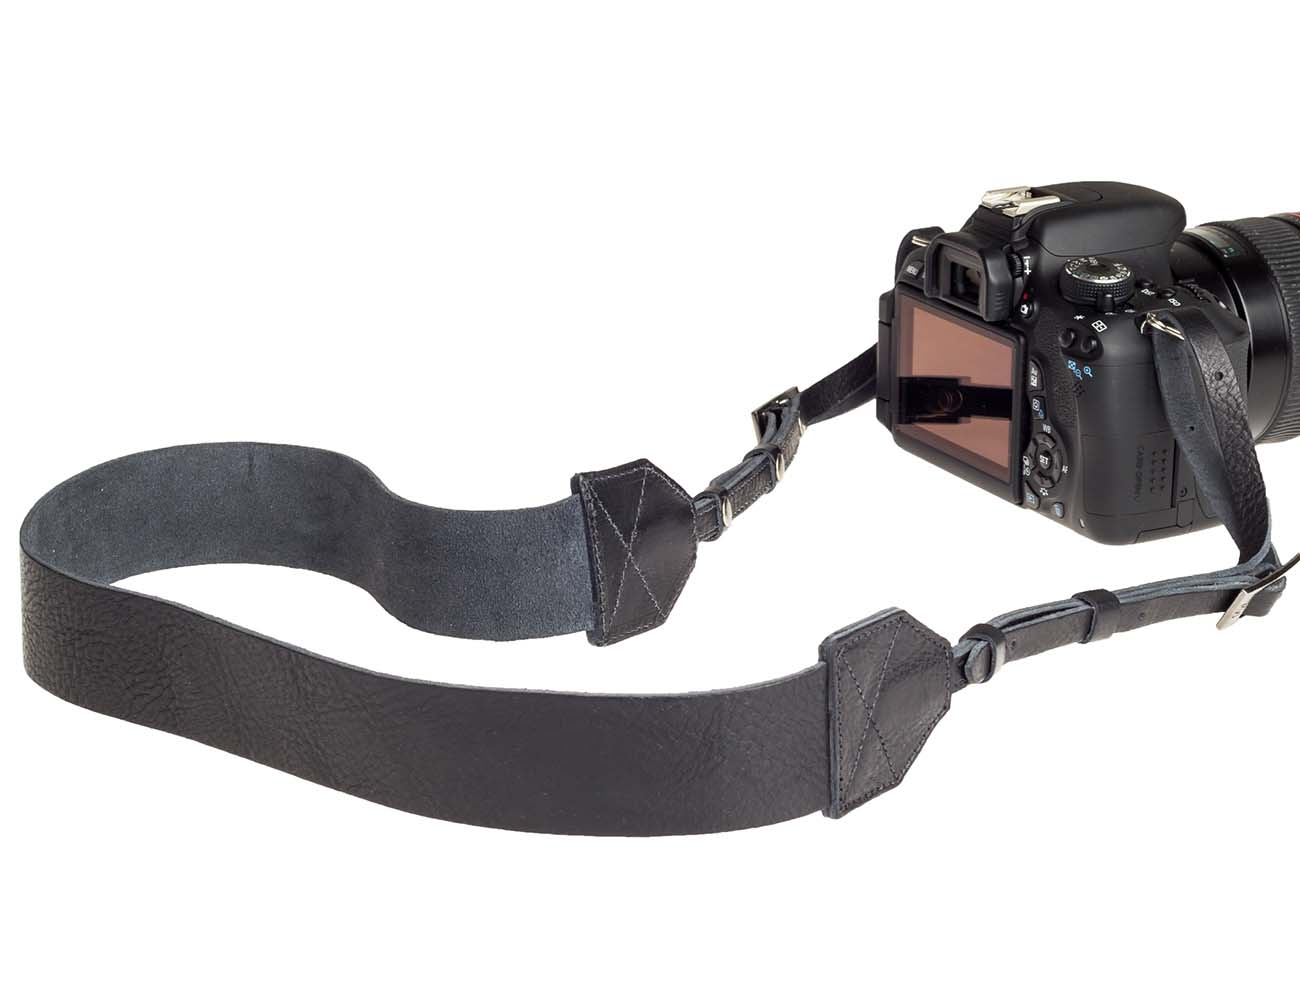 Morgan Tan Leather Camera Strap by A7